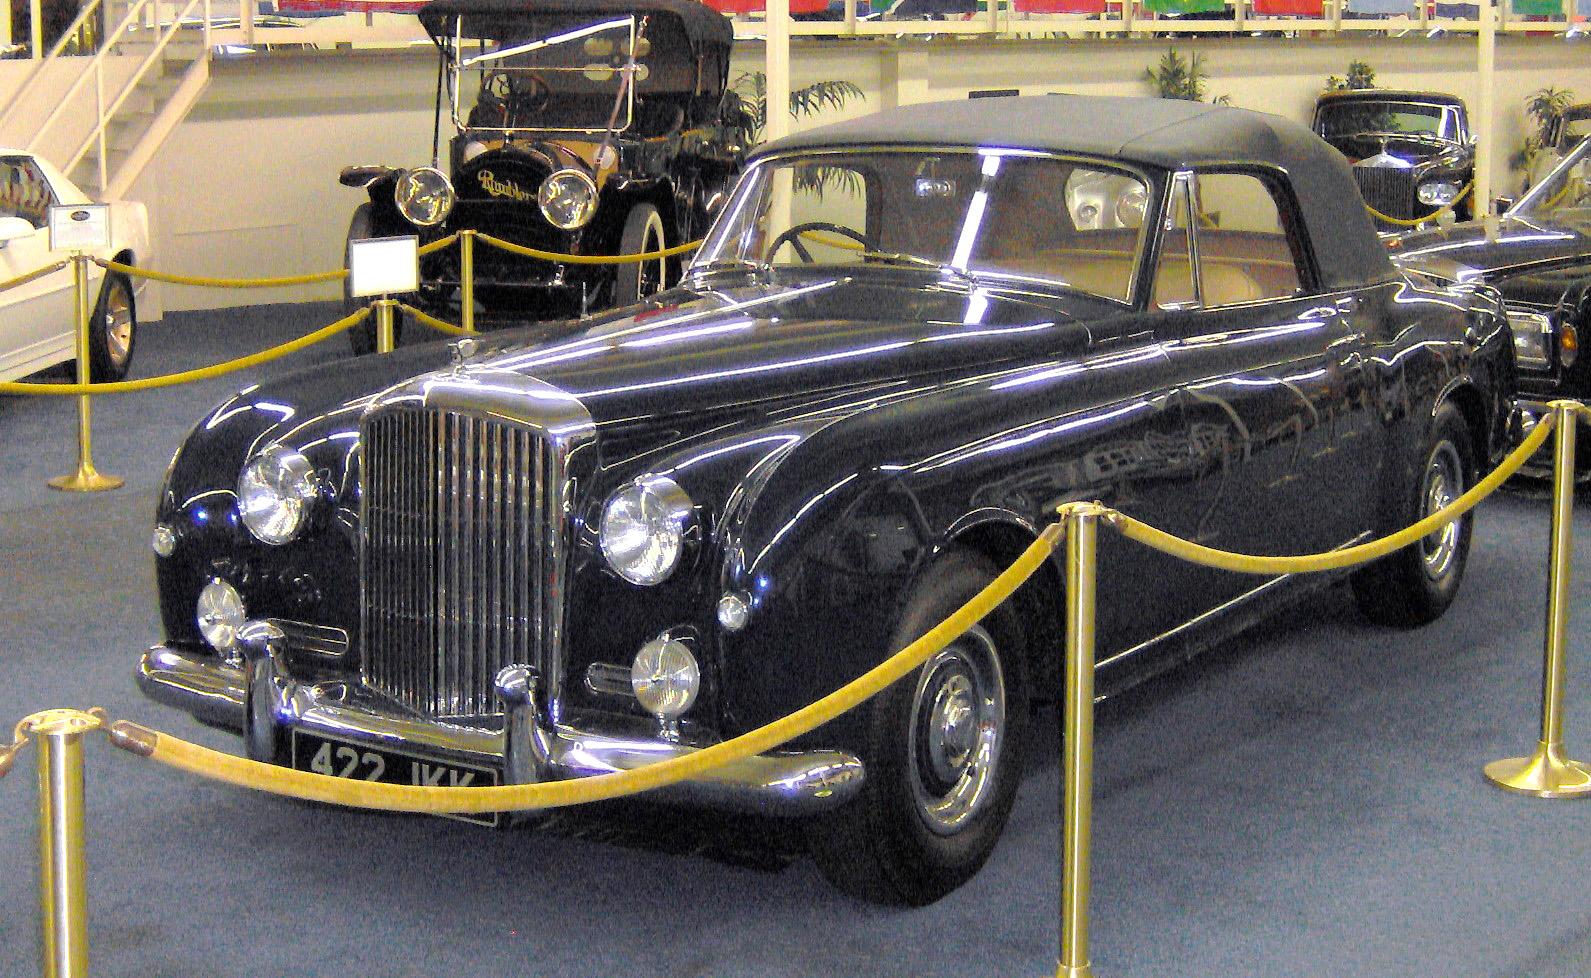 File:1955 Bentley S1 Continental Park Ward Drophead.JPG - Wikimedia ...